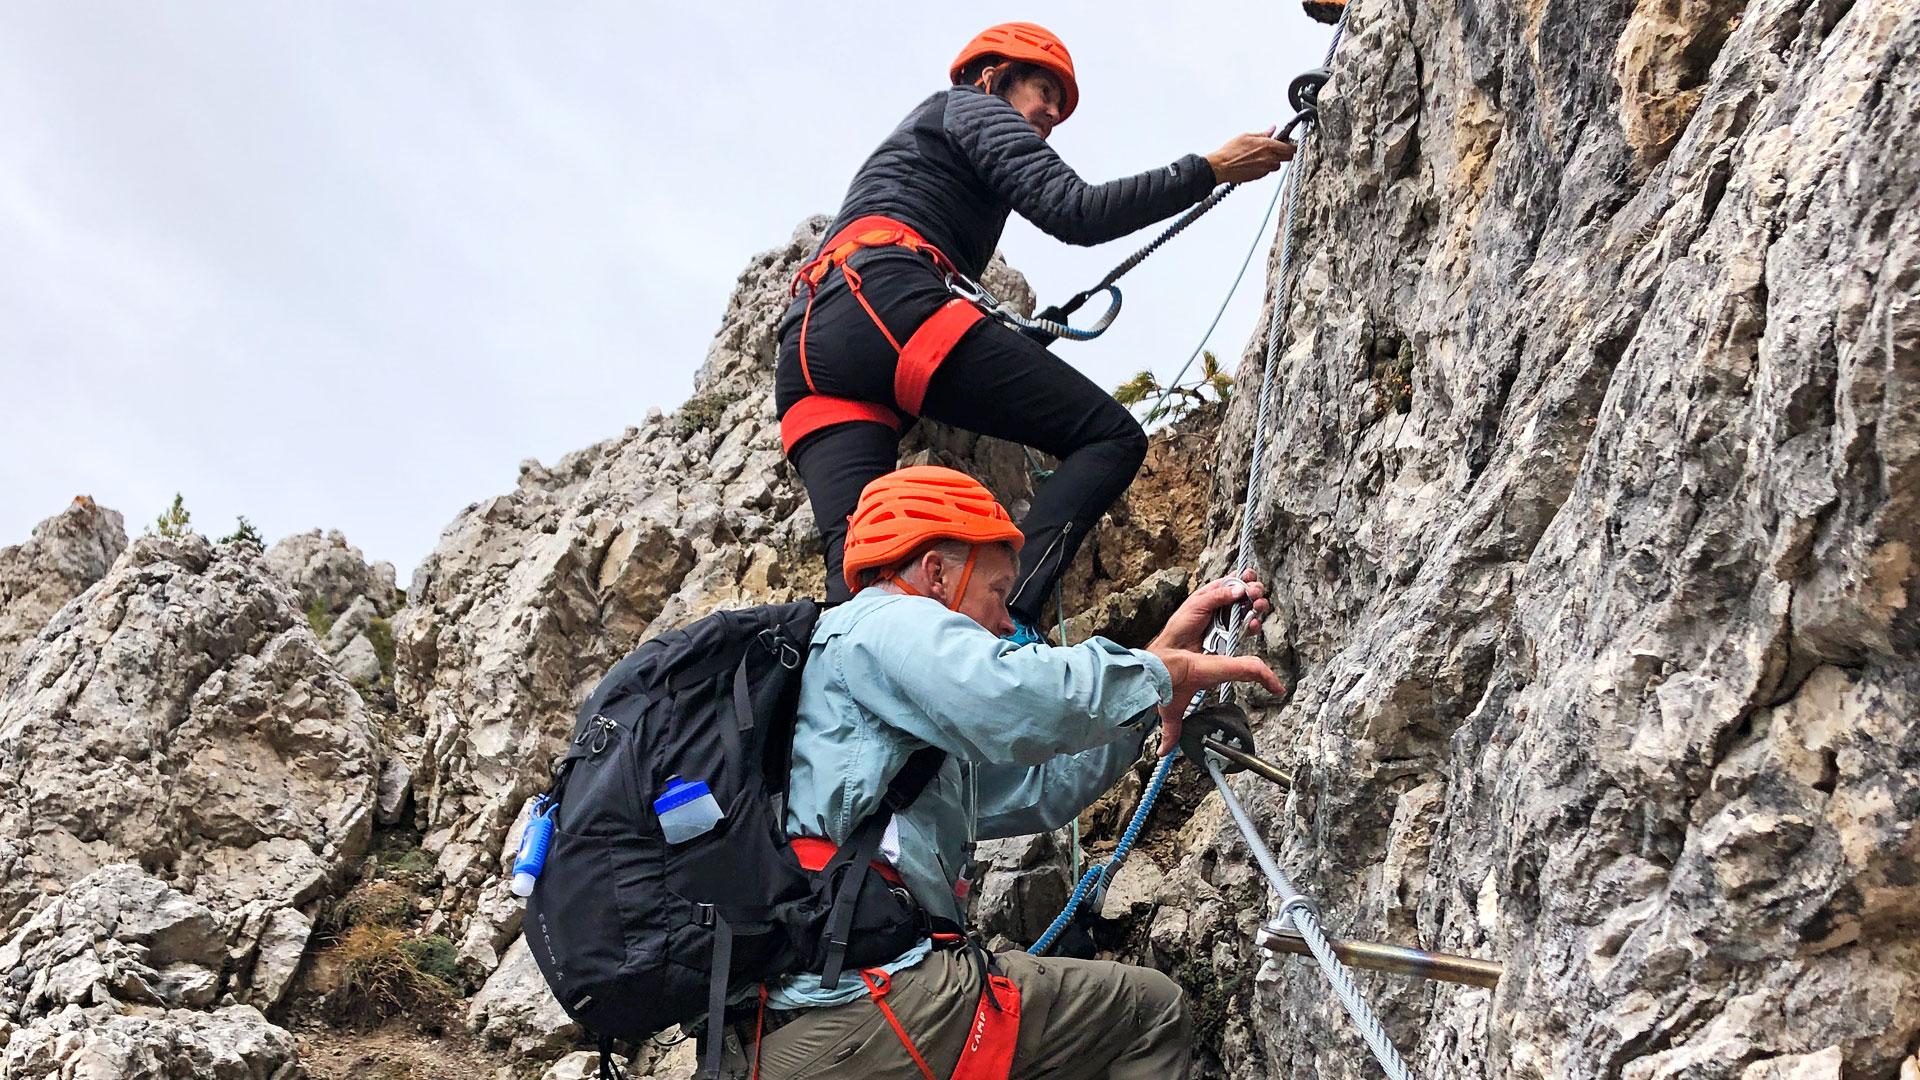 wp-content/uploads/itineraries/Dolomites/Dolomites-Via-Ferrata-Climbing-(14).jpg